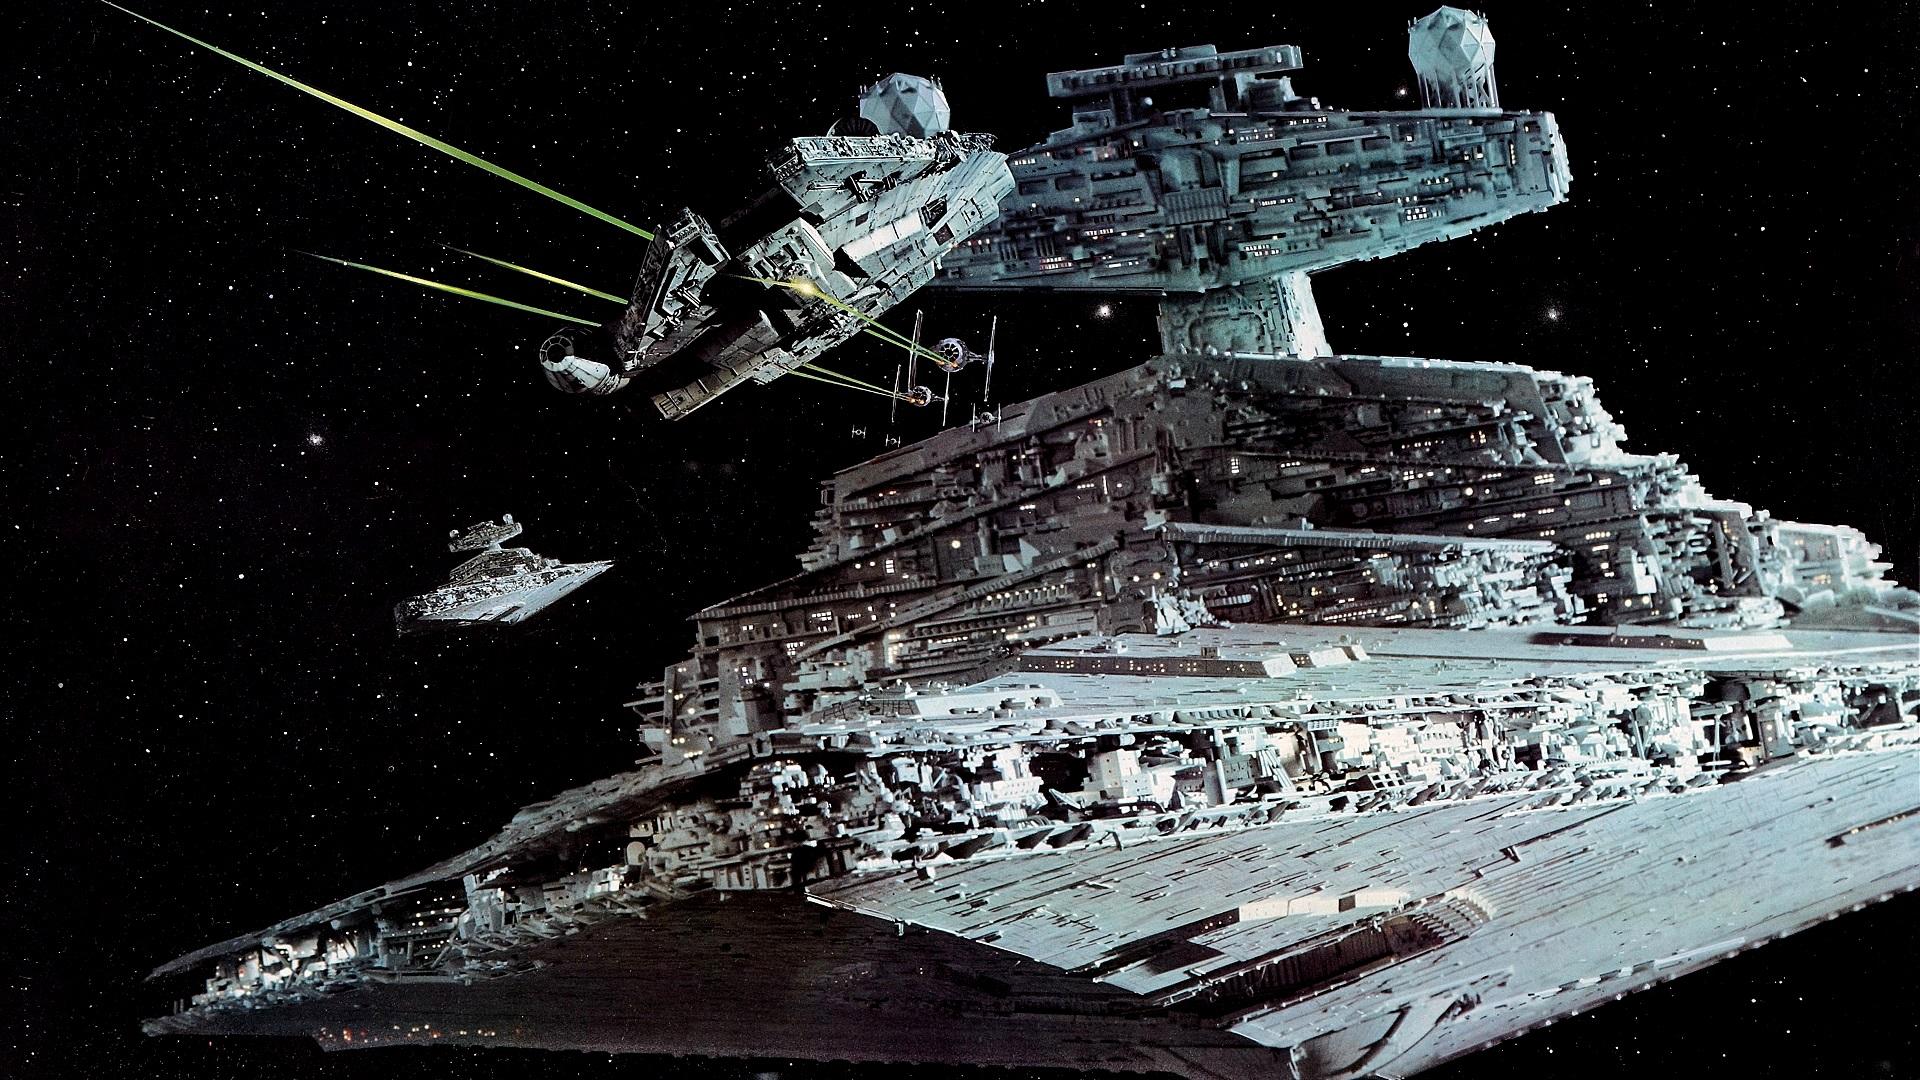 ... Star Wars Episode V: The Empire Strikes Back Star Destroyer Wallpaper